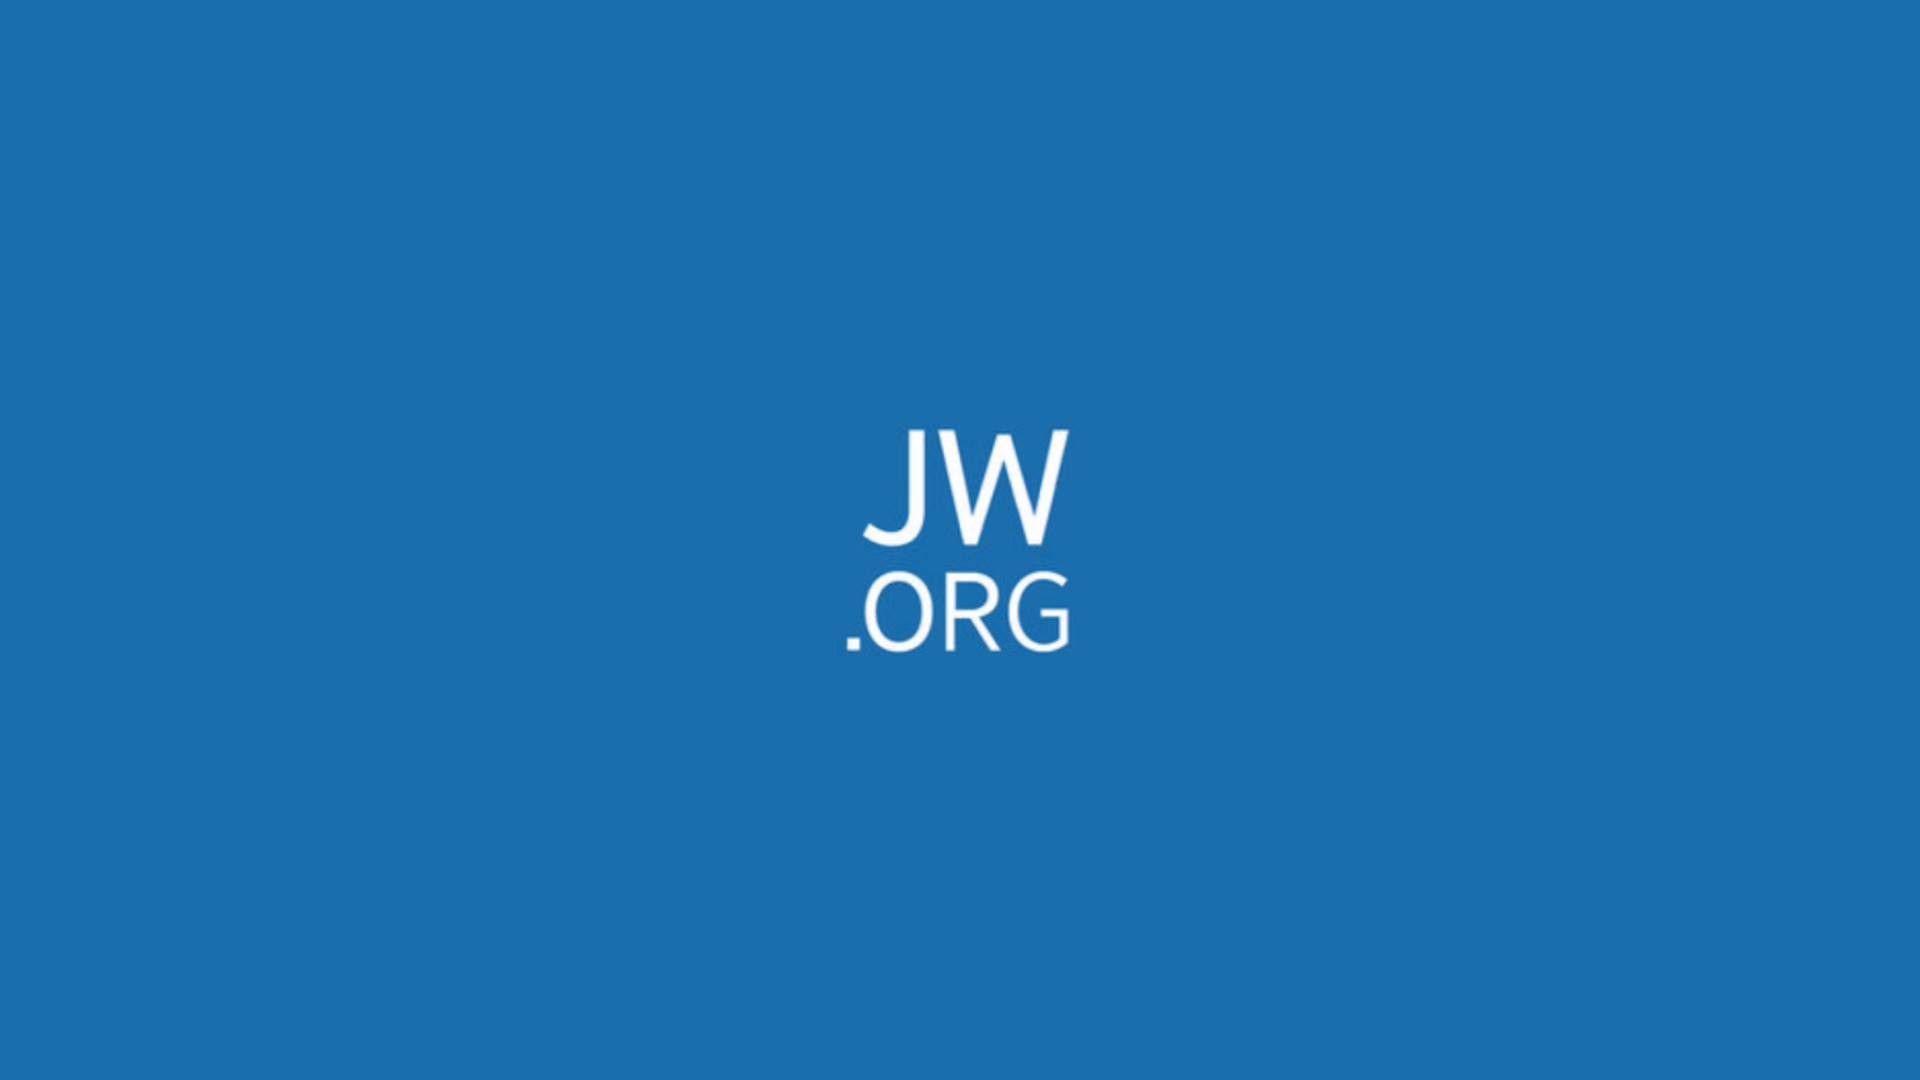 Jw Org Wallpaper Desktop 64 images Jworg Desktop wallpaper 1920x1080